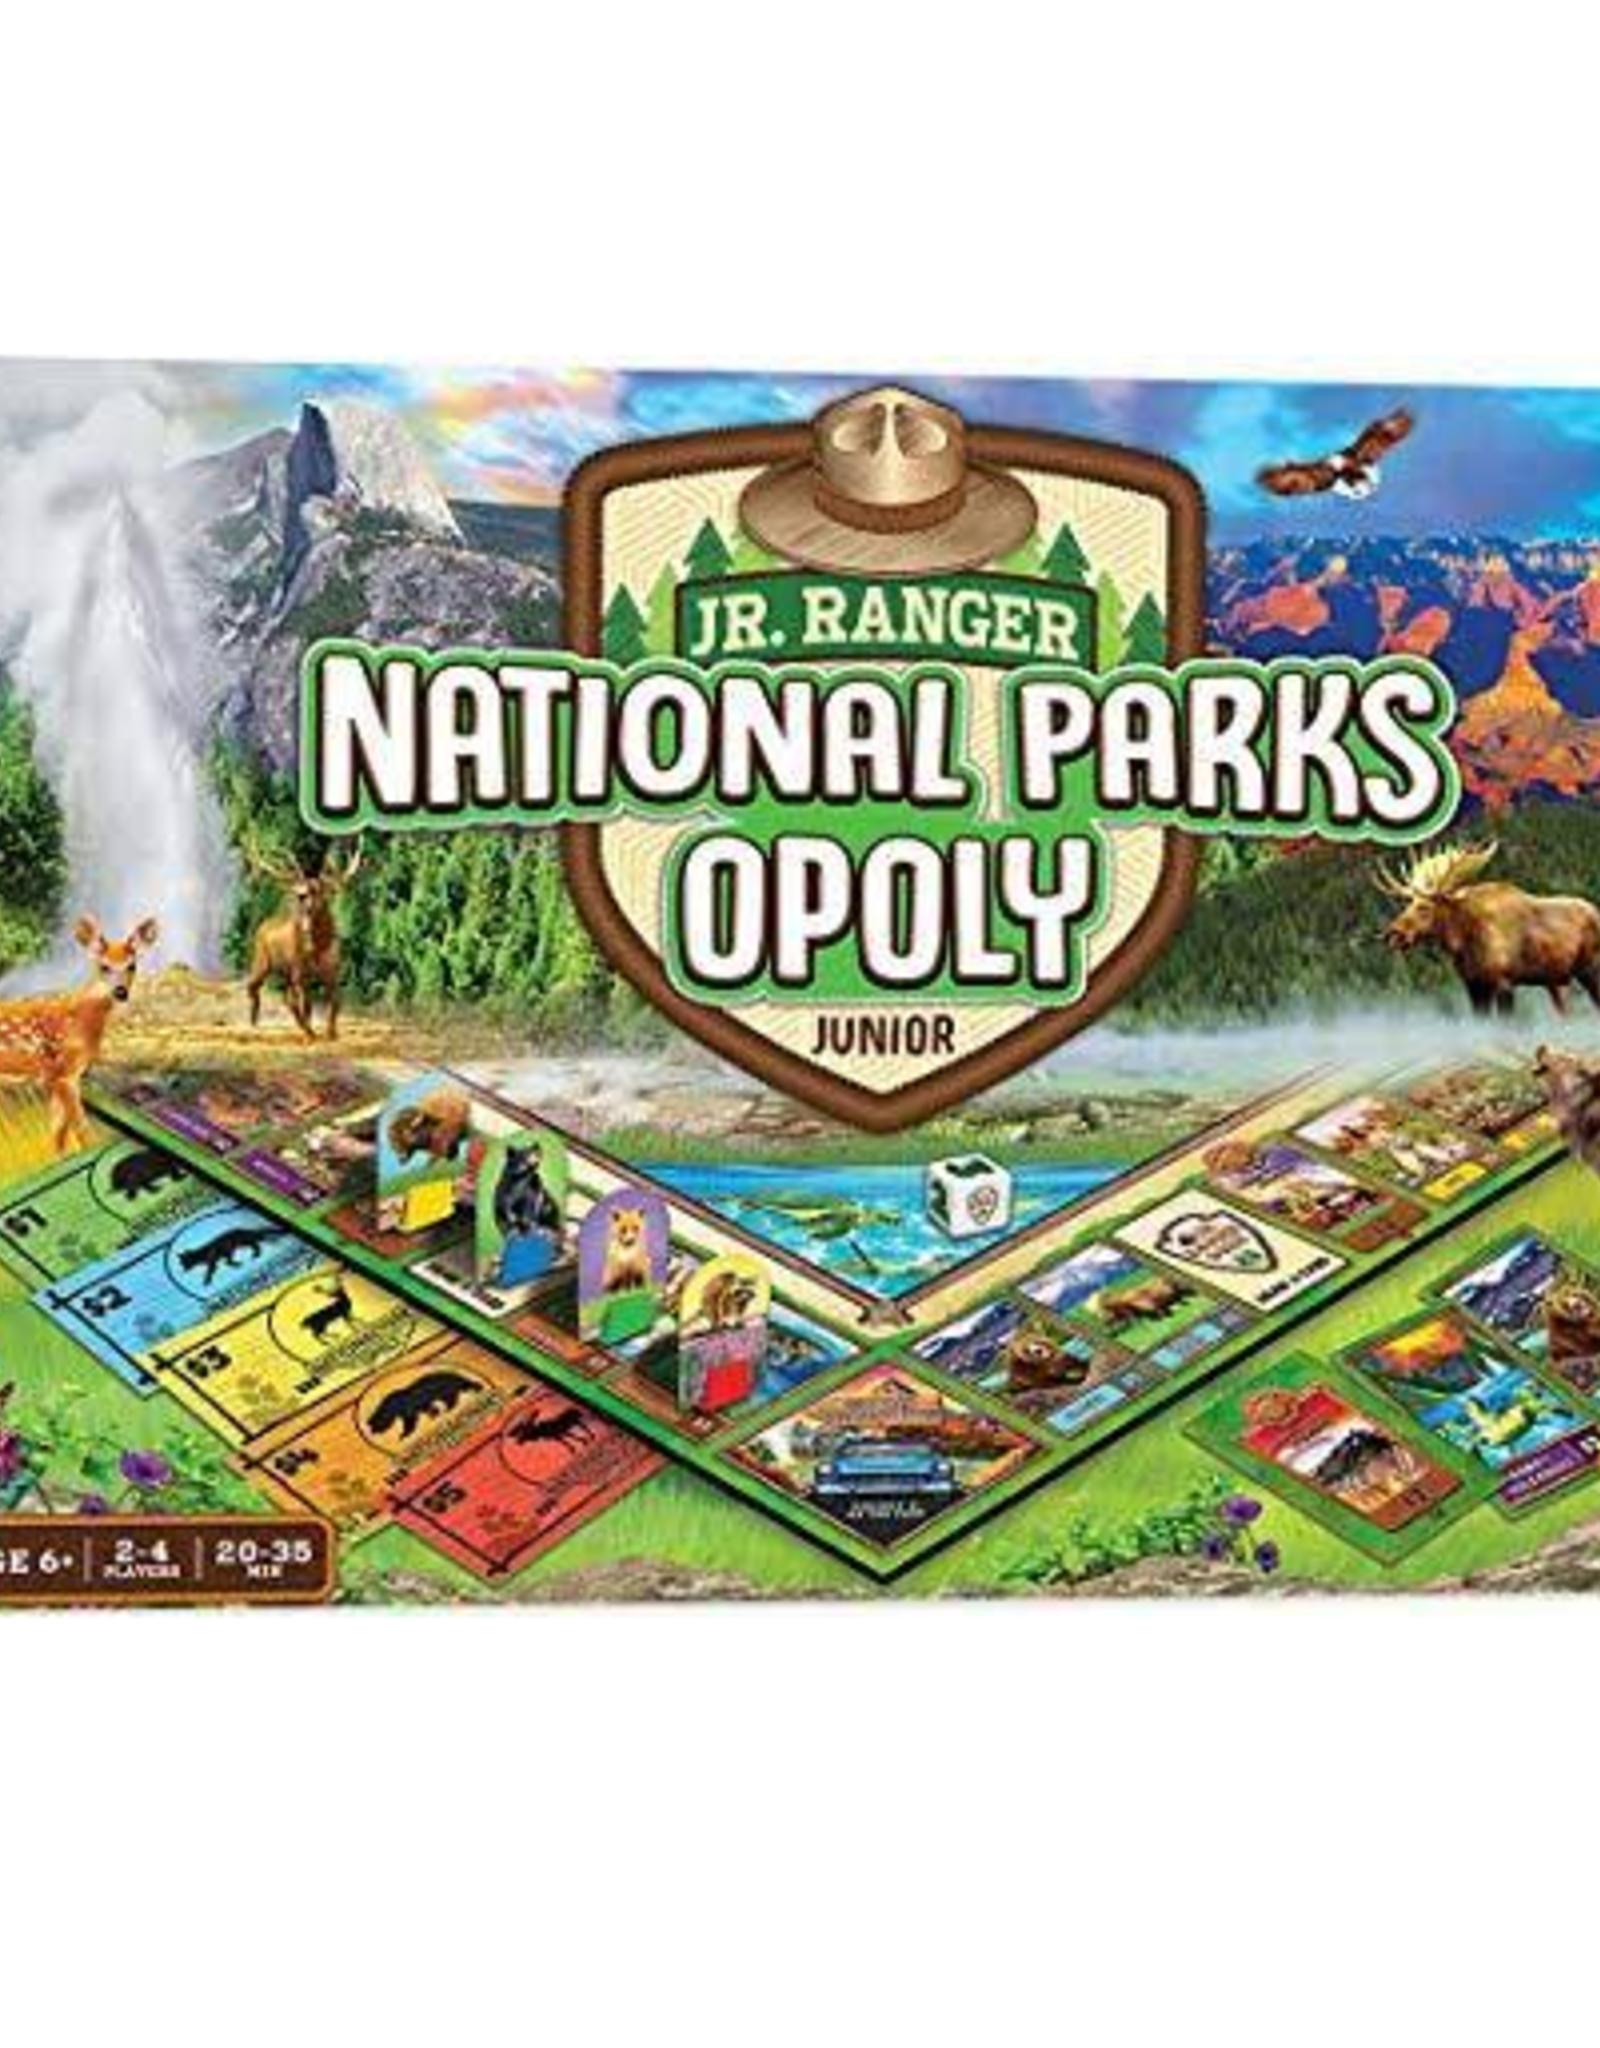 National Parks- Opoly Jr game